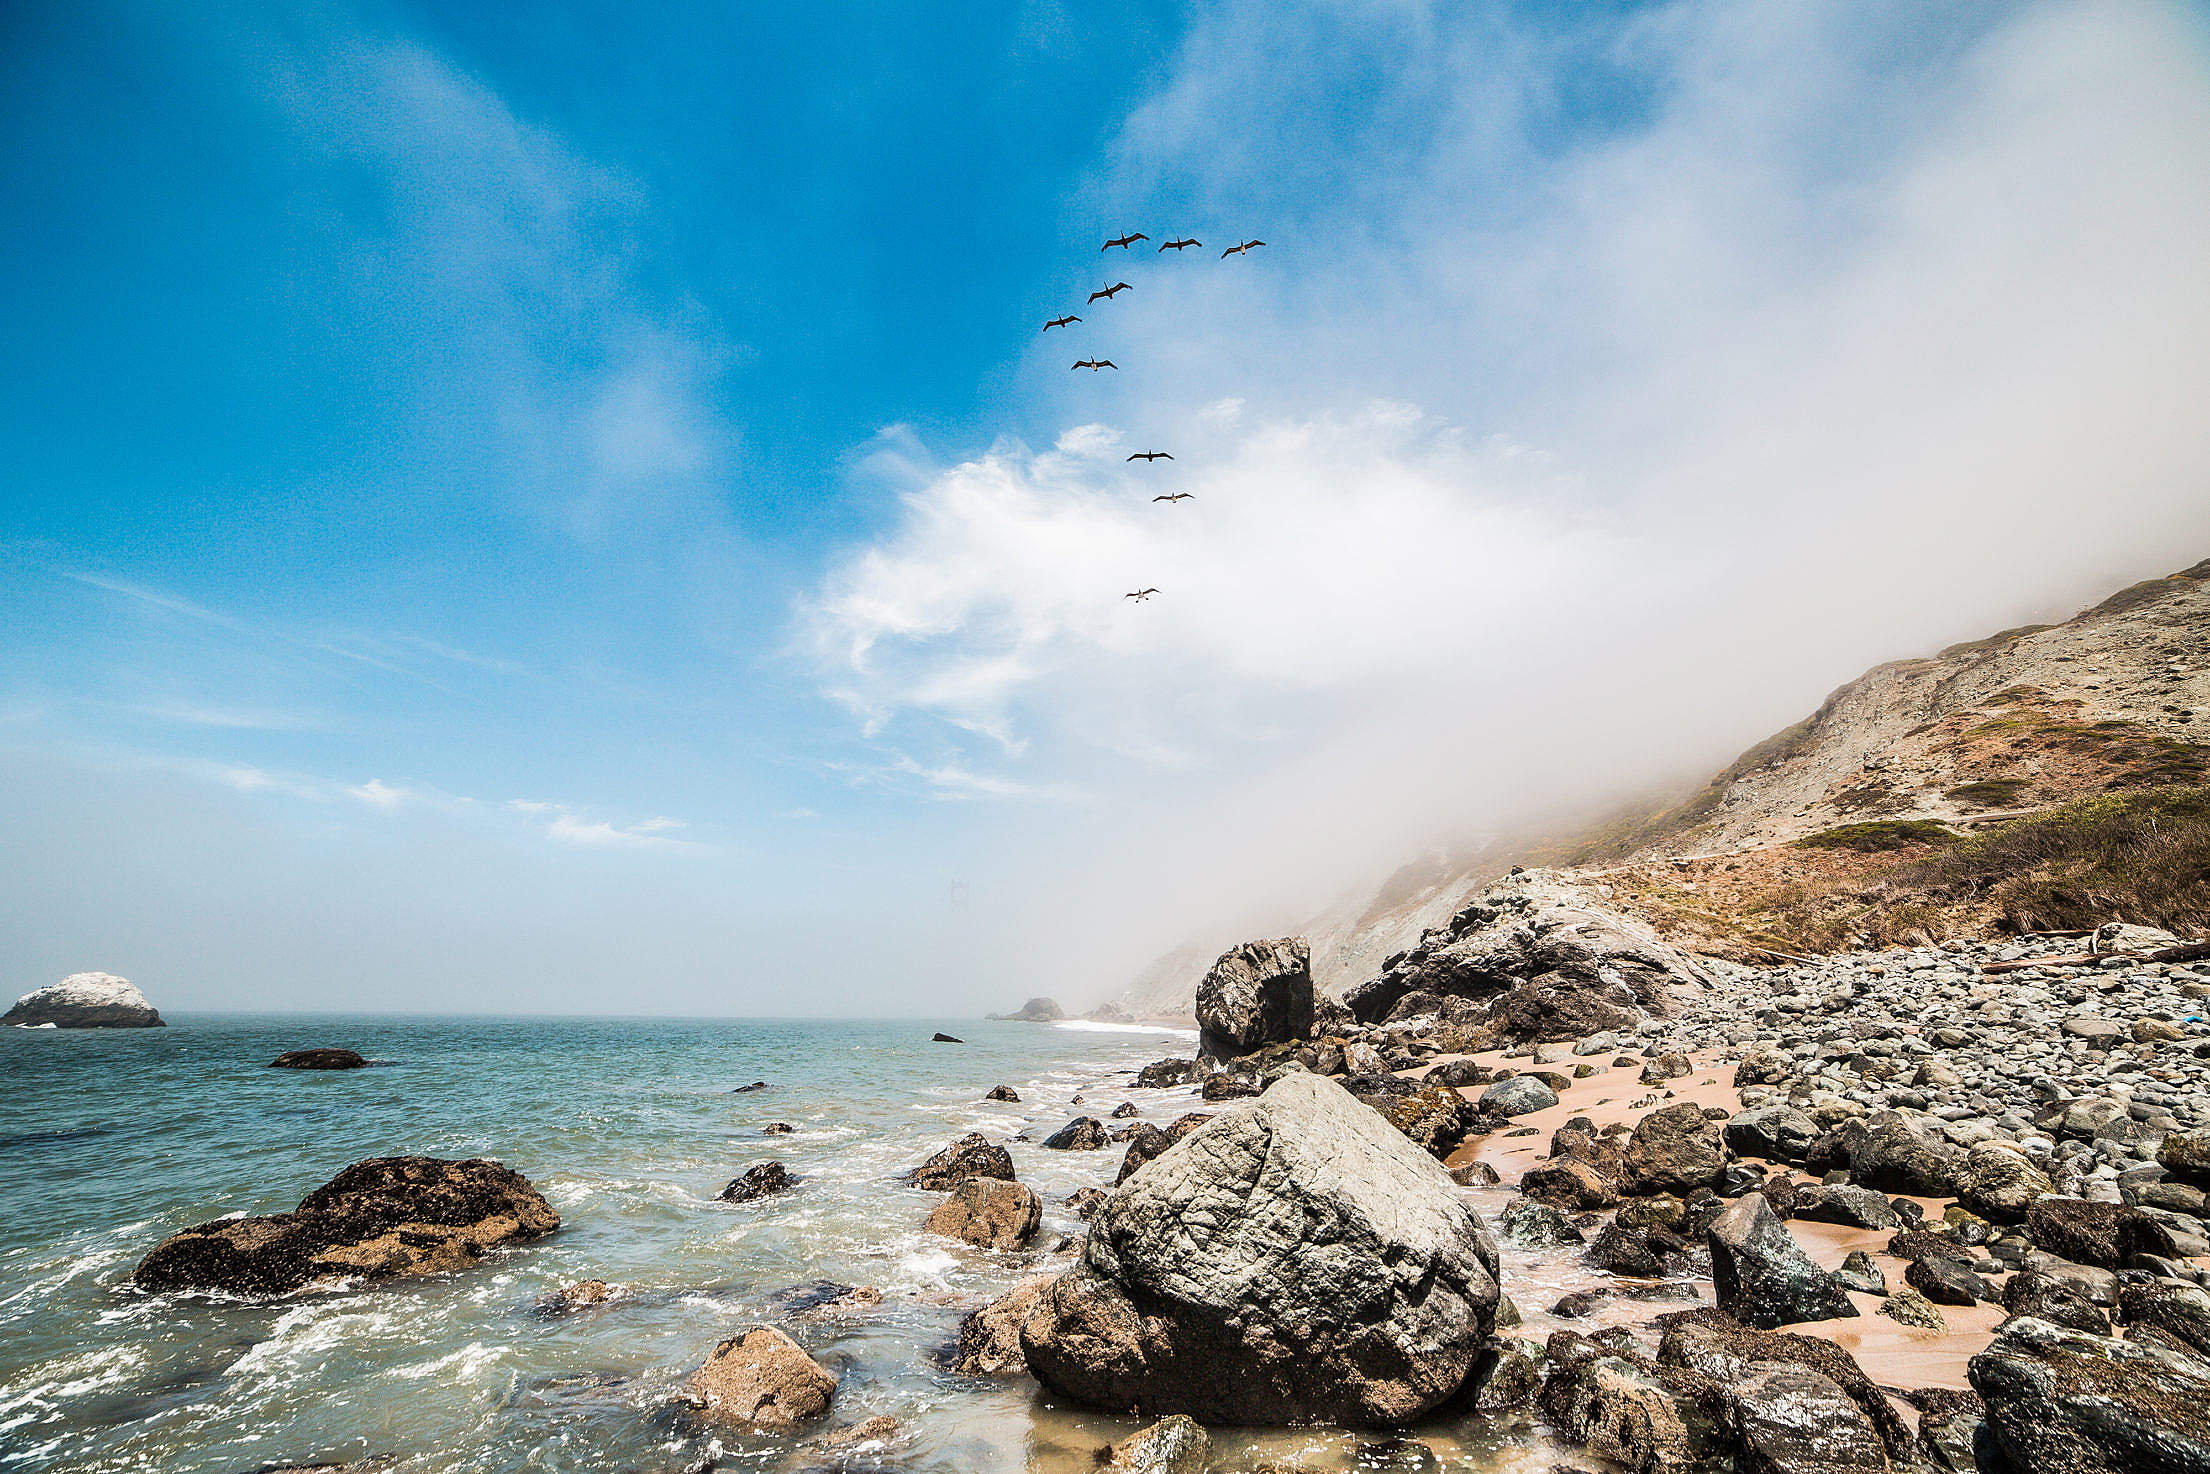 9 Birds Flying Along The Ocean Shoreline Free Stock Photo